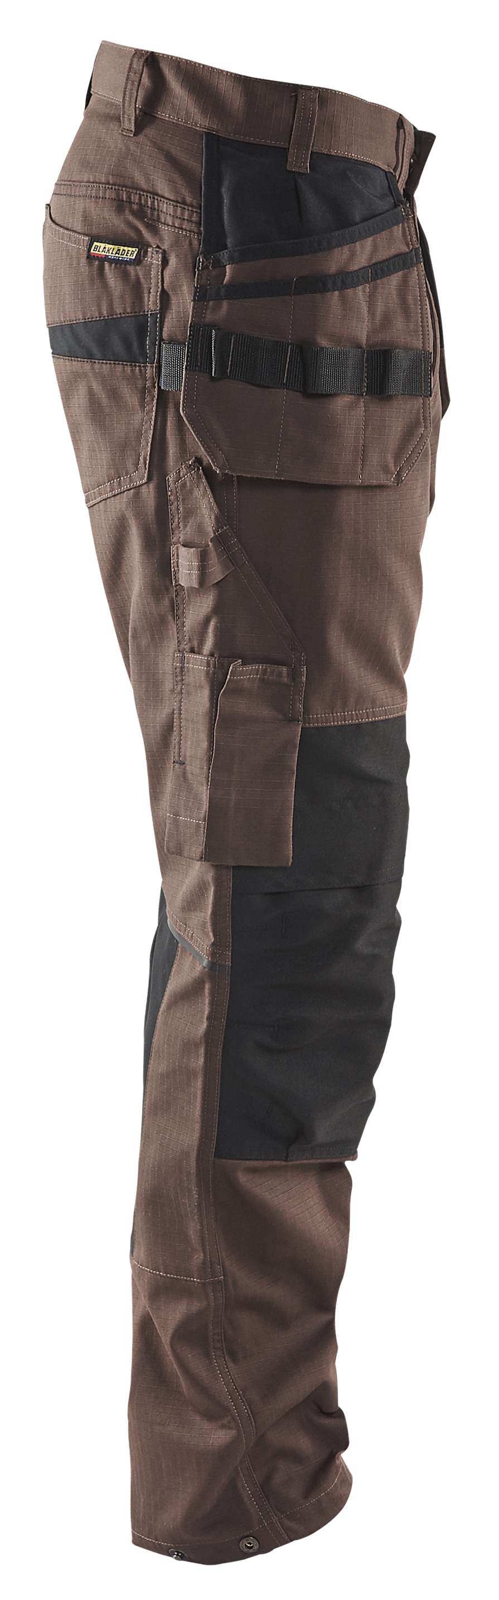 Blaklader Werkbroeken 14961330 met Stretch bruin-zwart(7899)